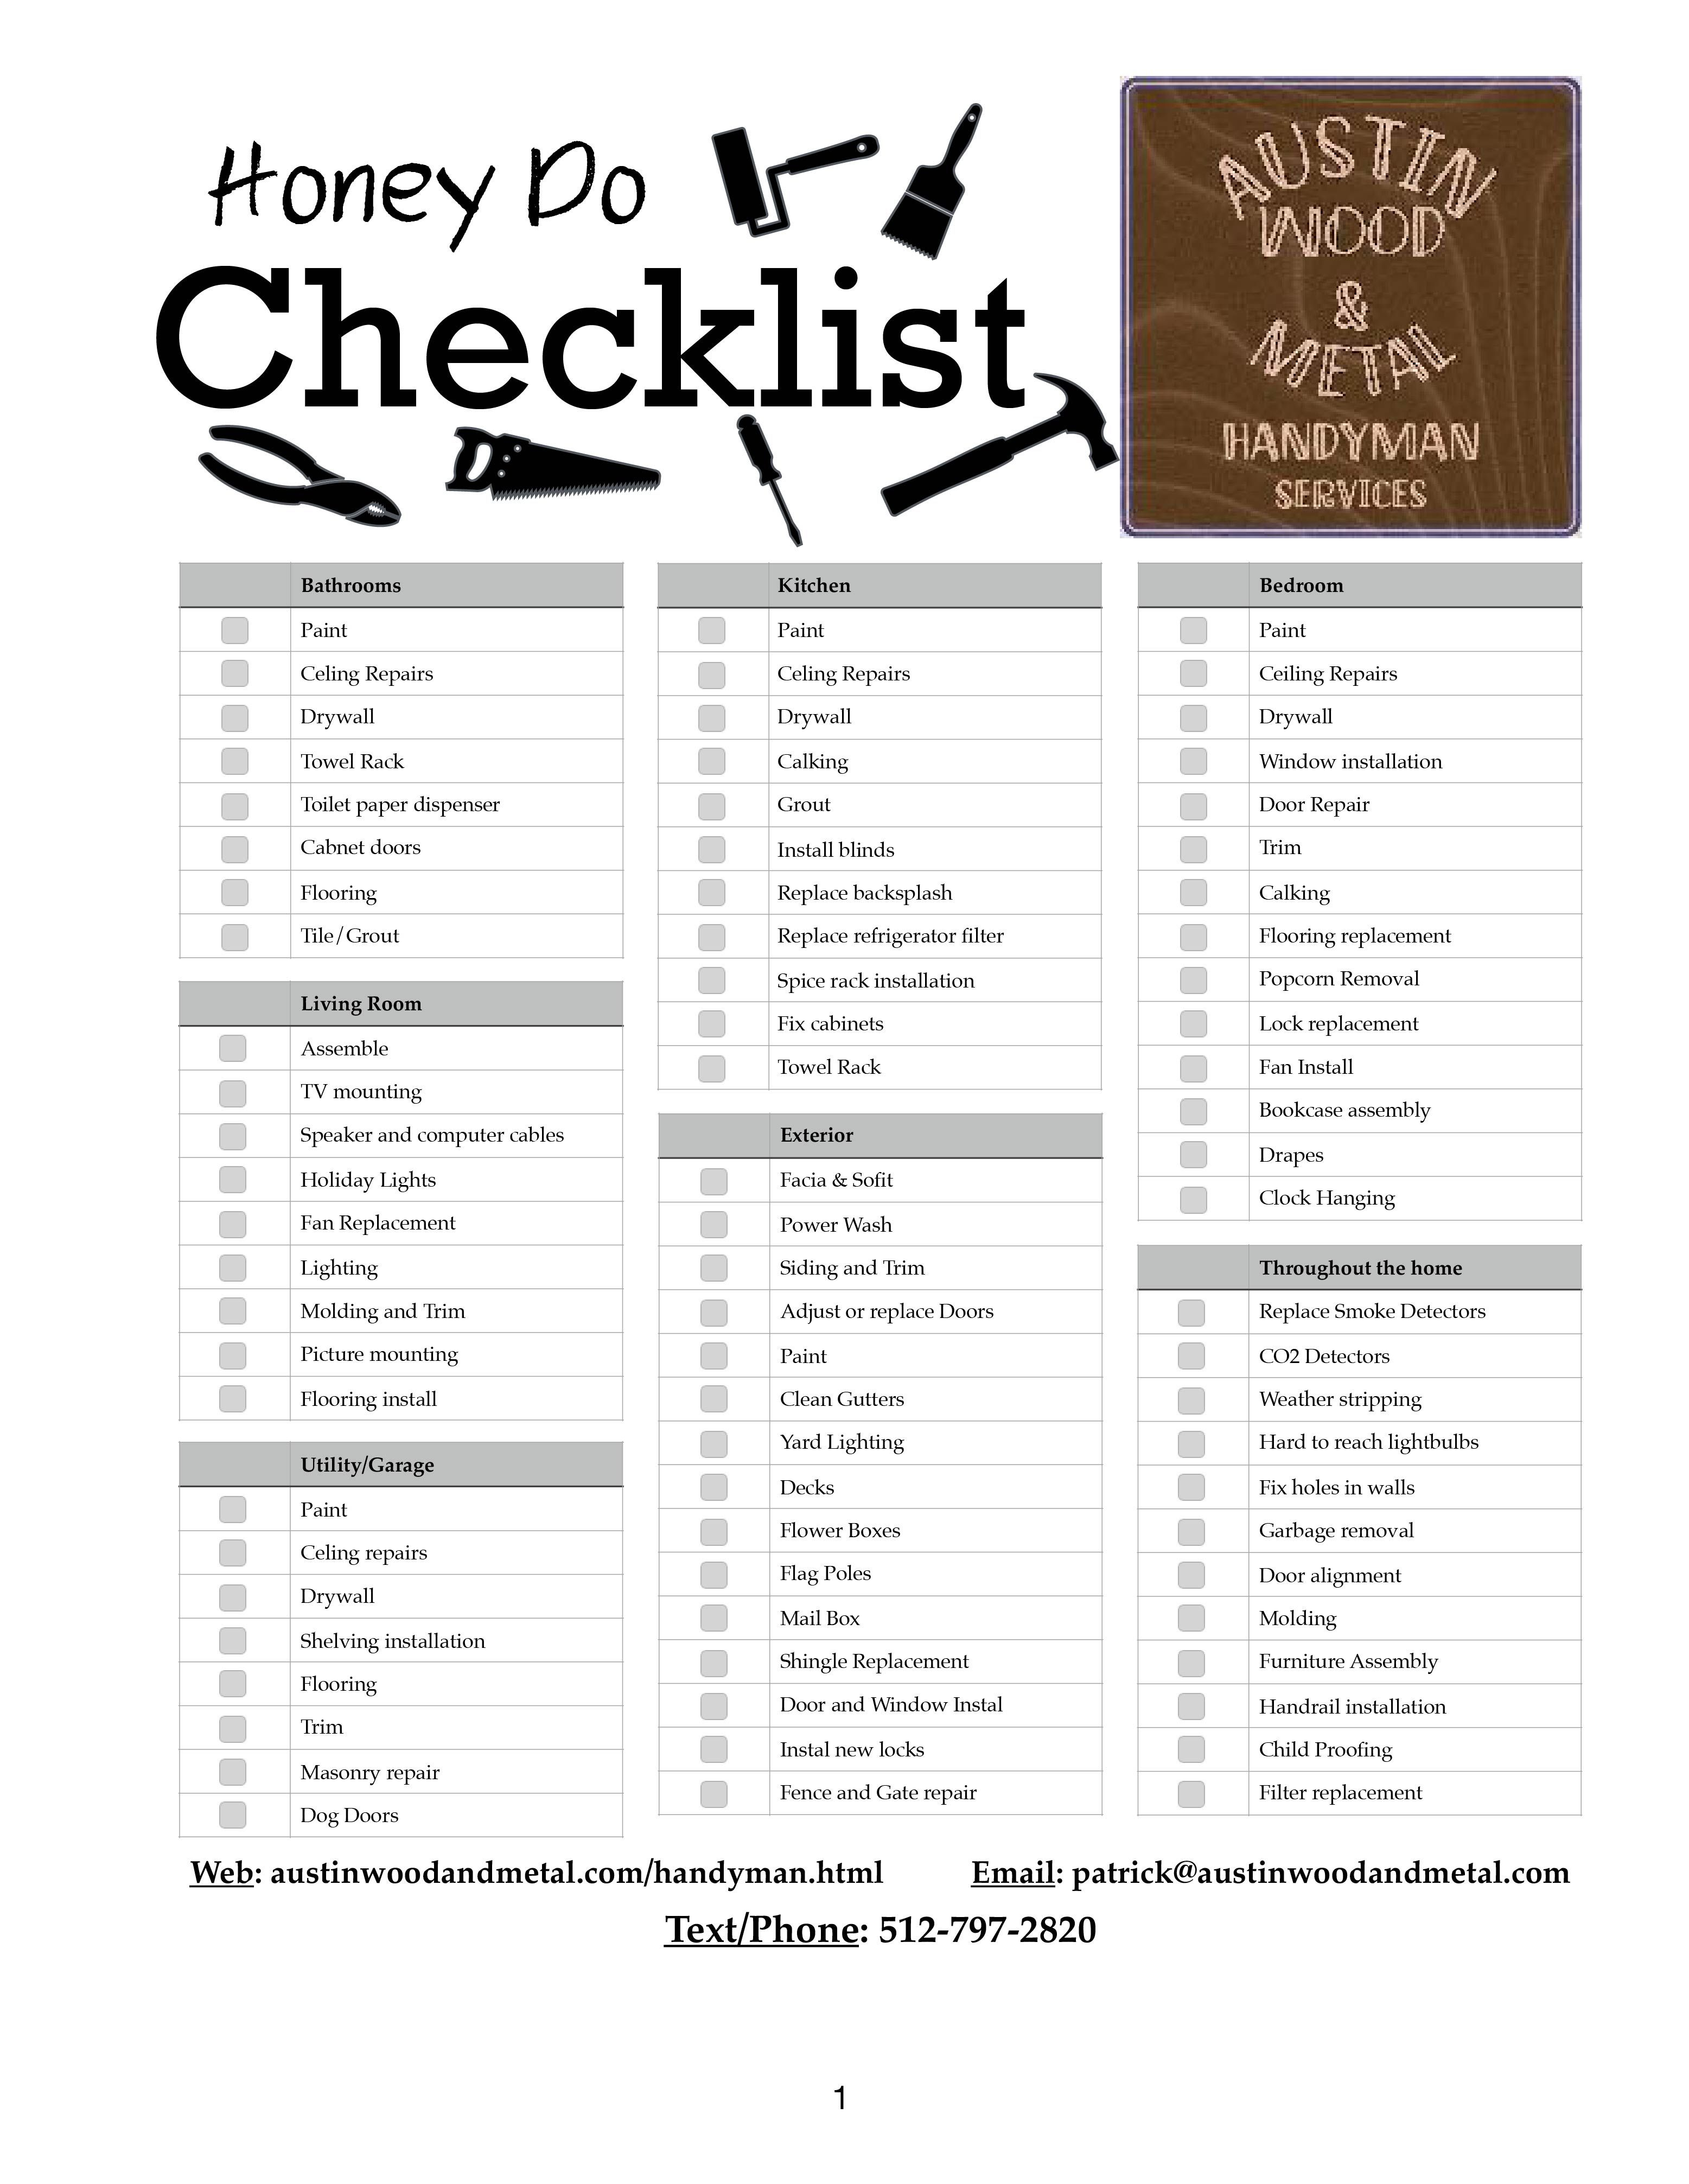 Austin wood and metal honey do checklist handyman